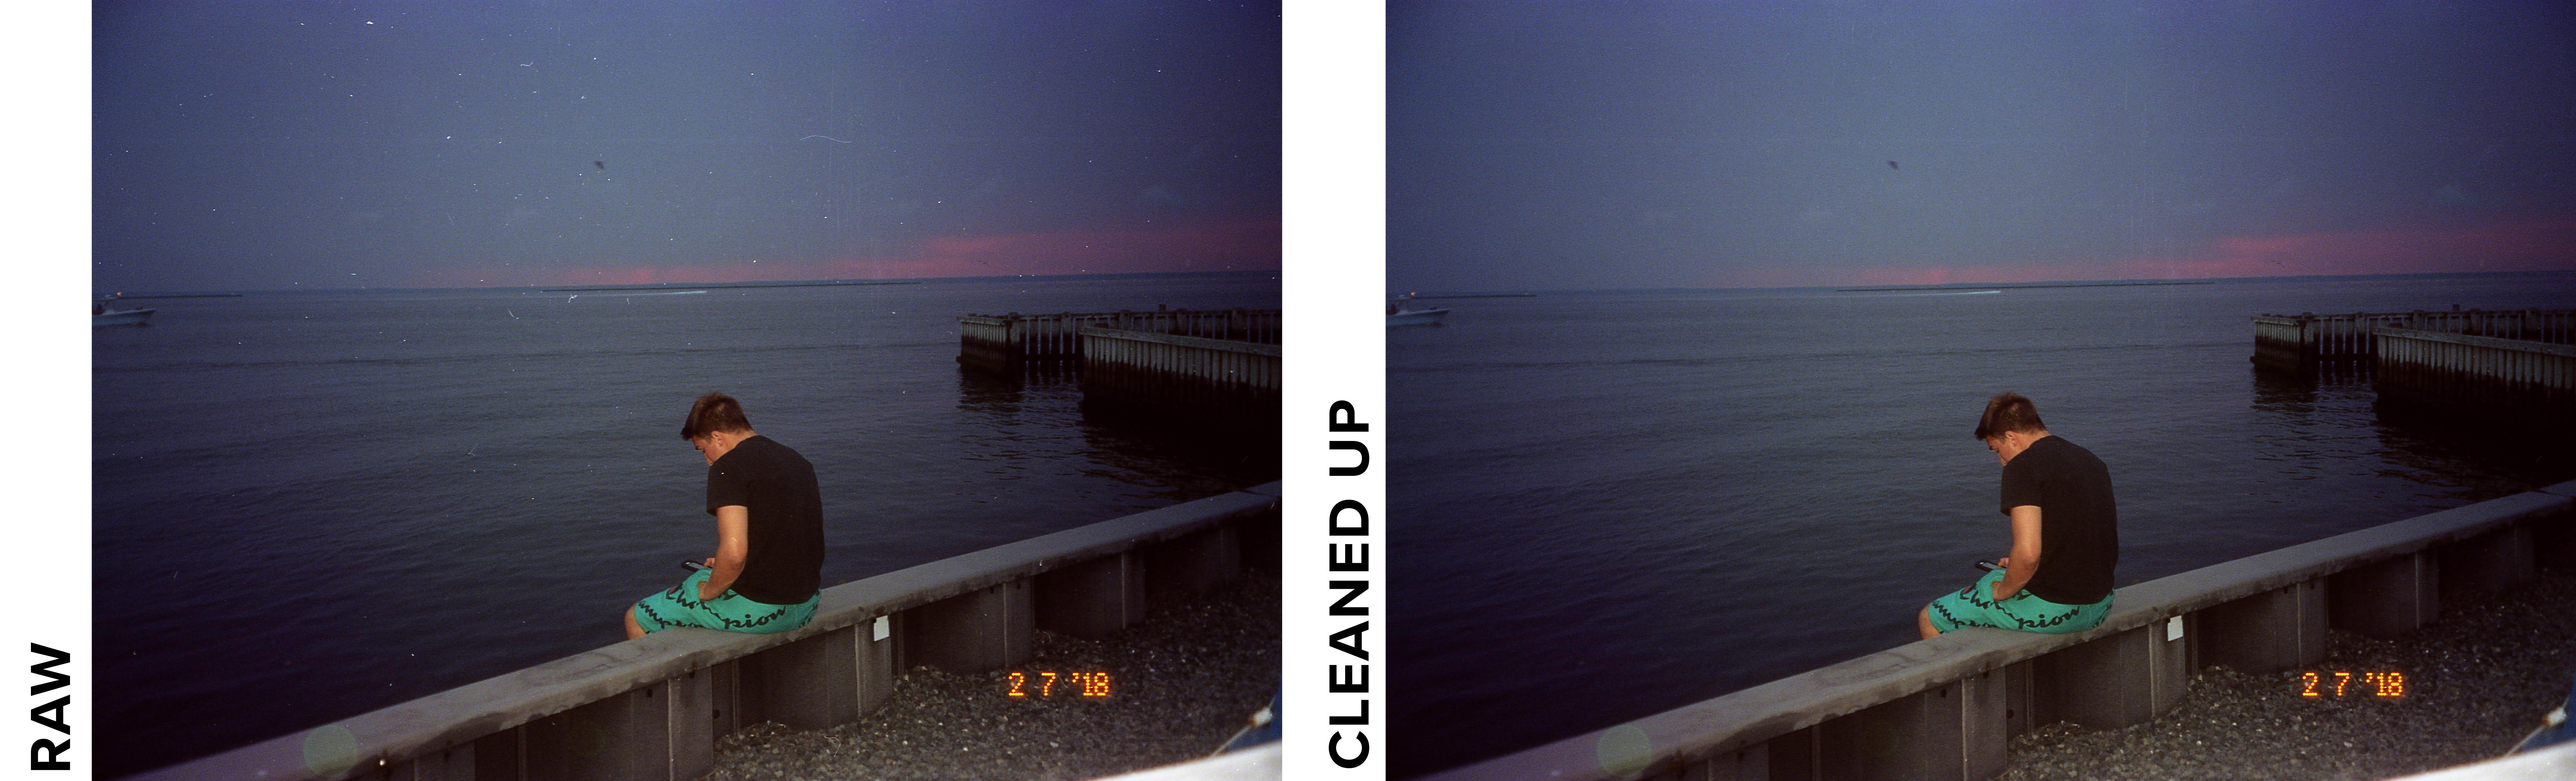 Dust-Huji-App-vs.-Real-Color-Negative-Film-FilterGrade